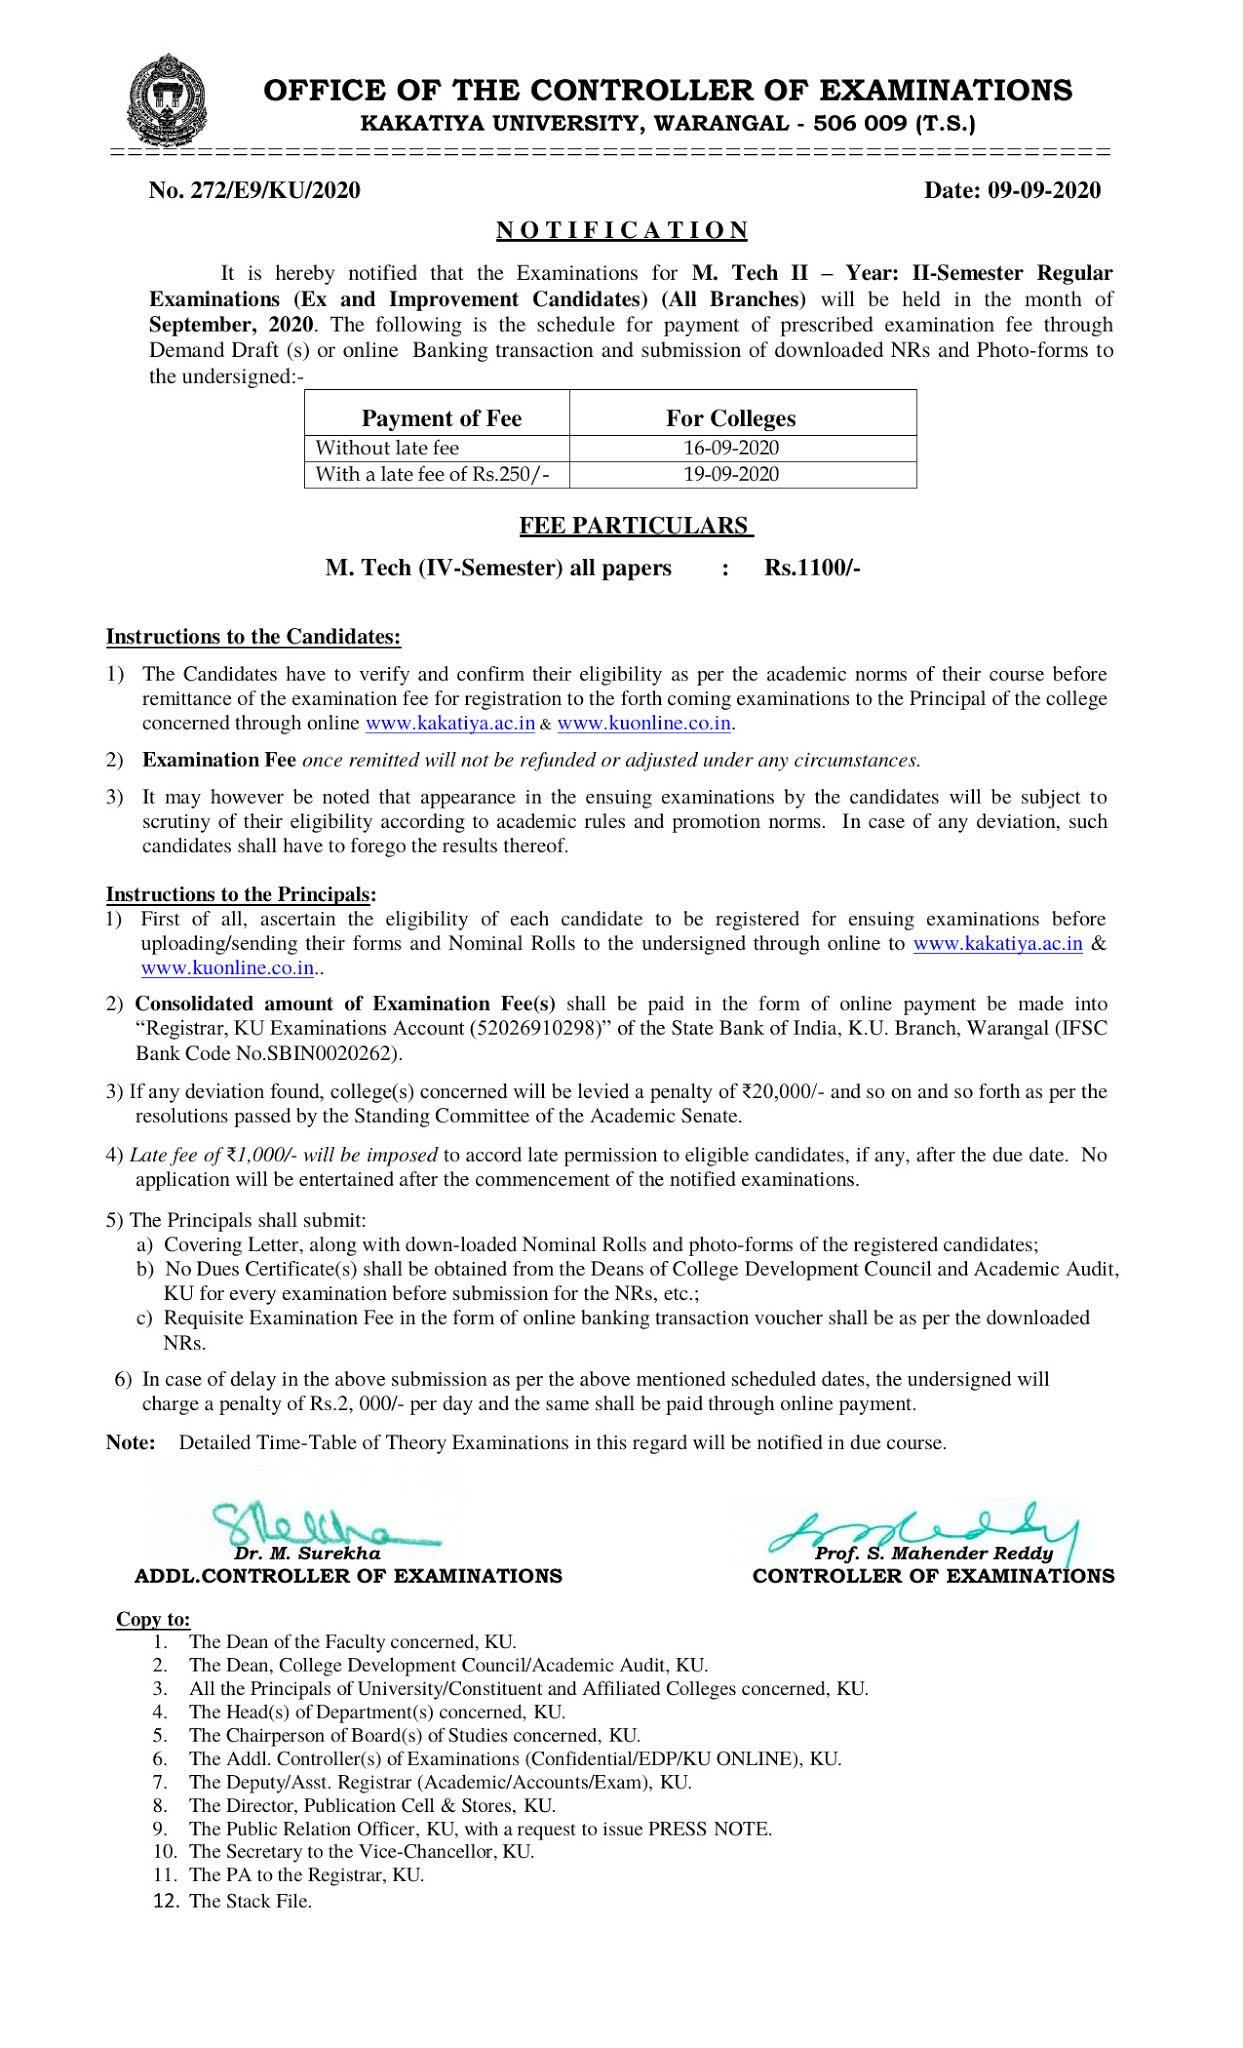 Kakatiya University M.Tech 2nd Year 2nd Sem Regular Sep 2020 Exam Fee Notification